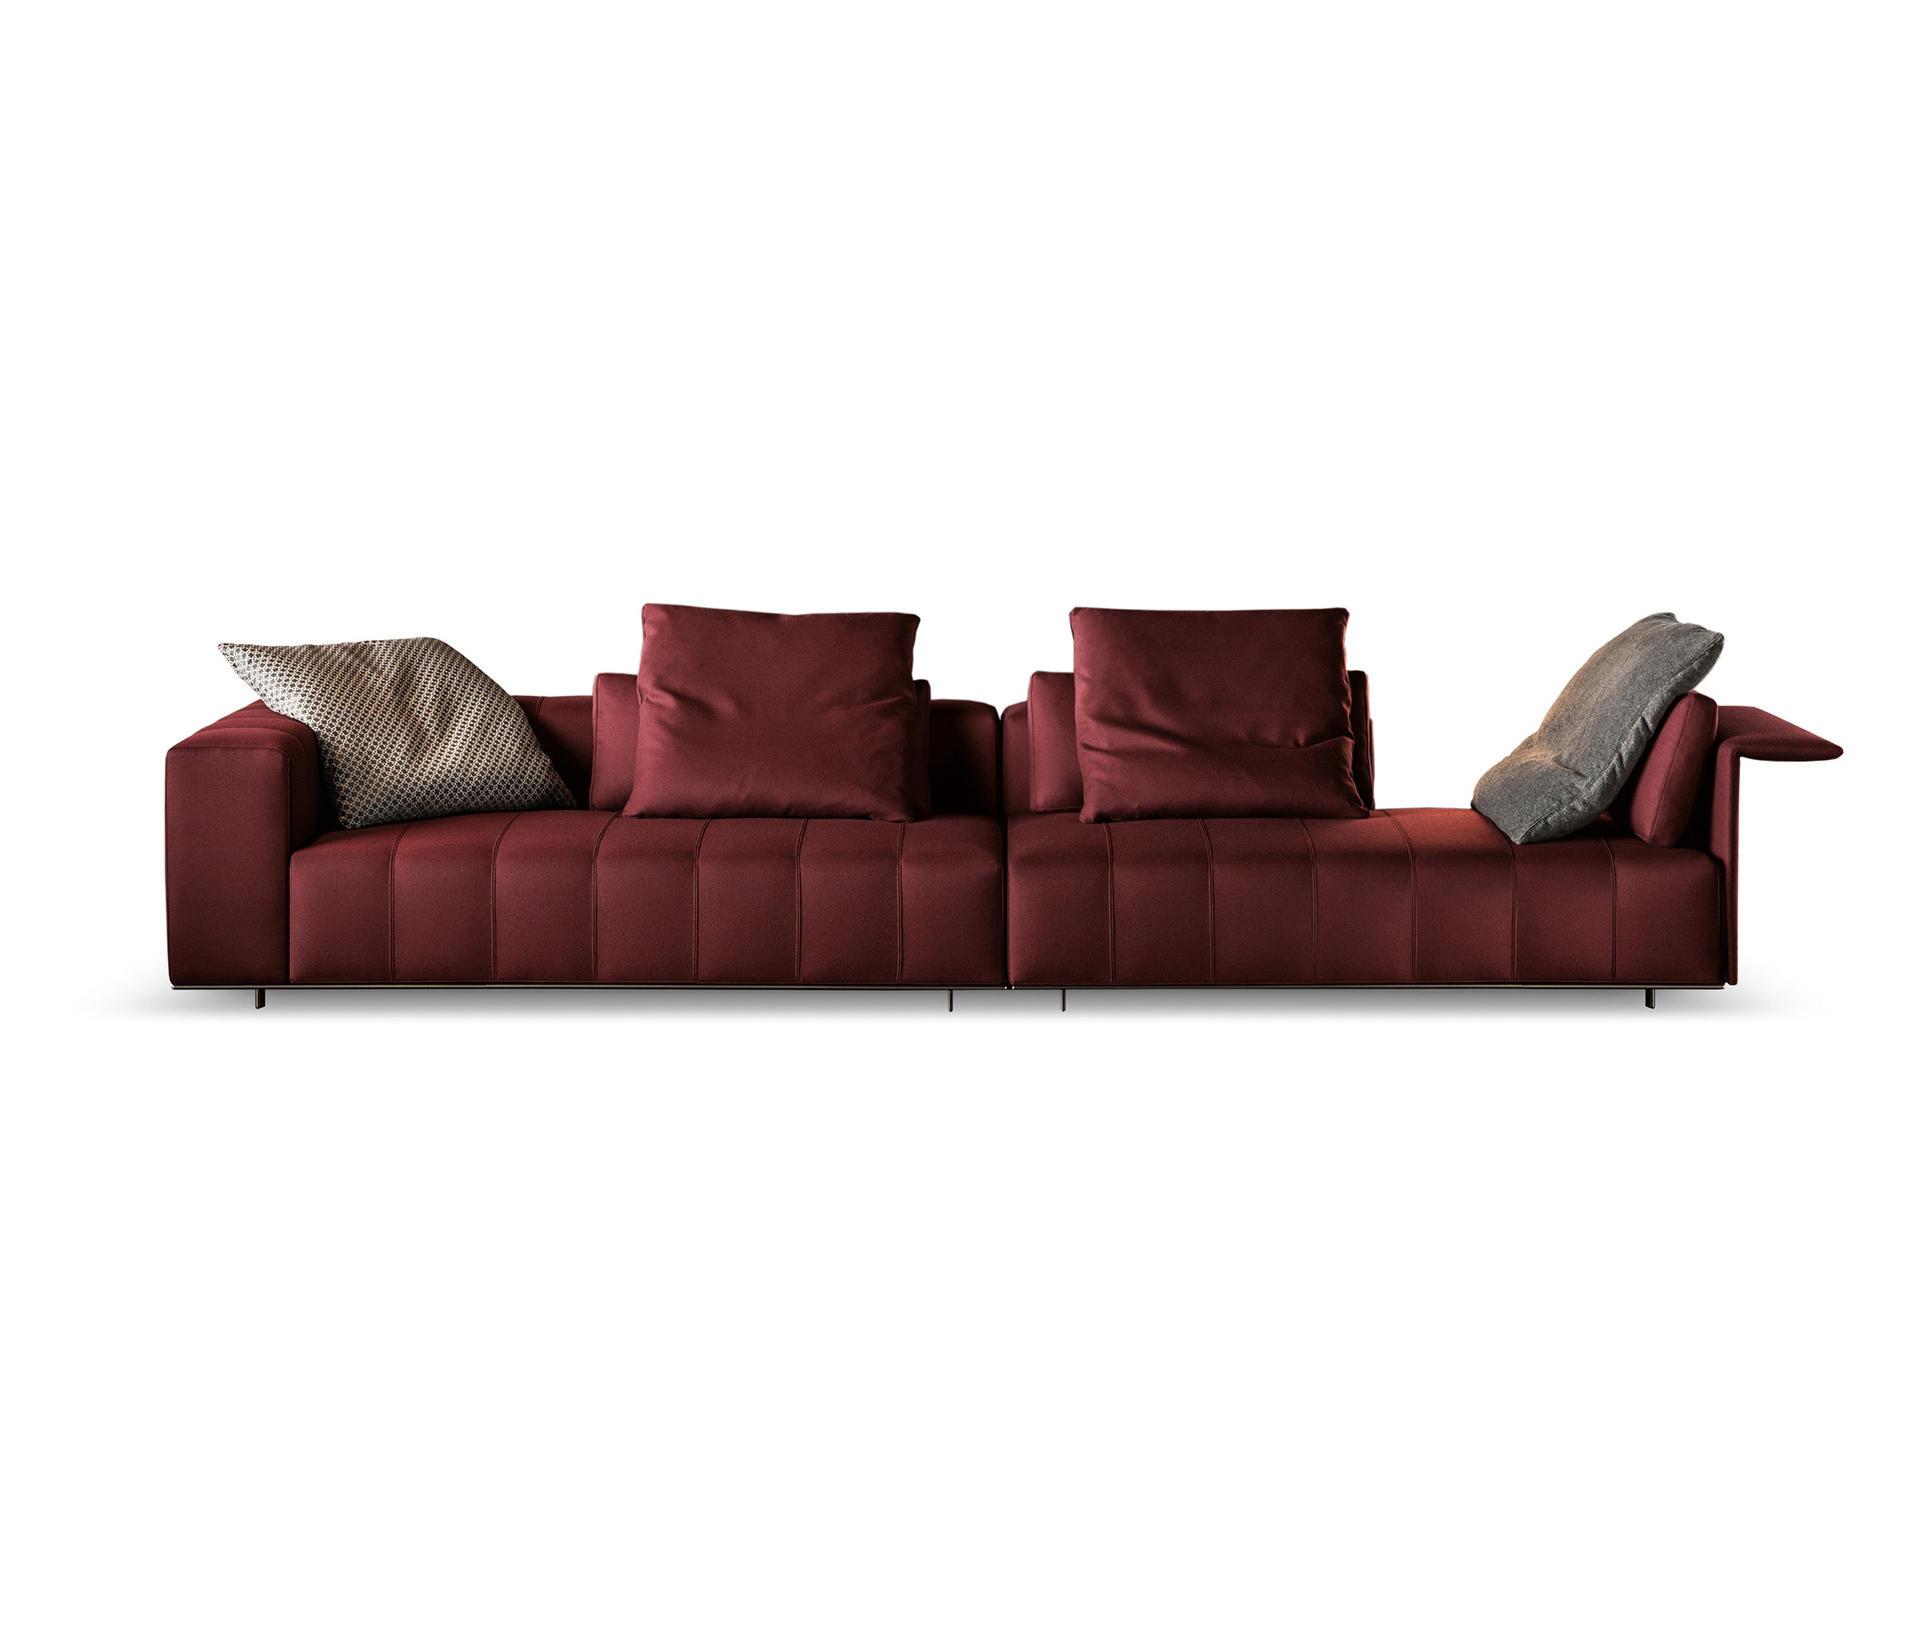 Freeman tailor sofa lounge sofas from minotti architonic - Divano minotti prezzo ...